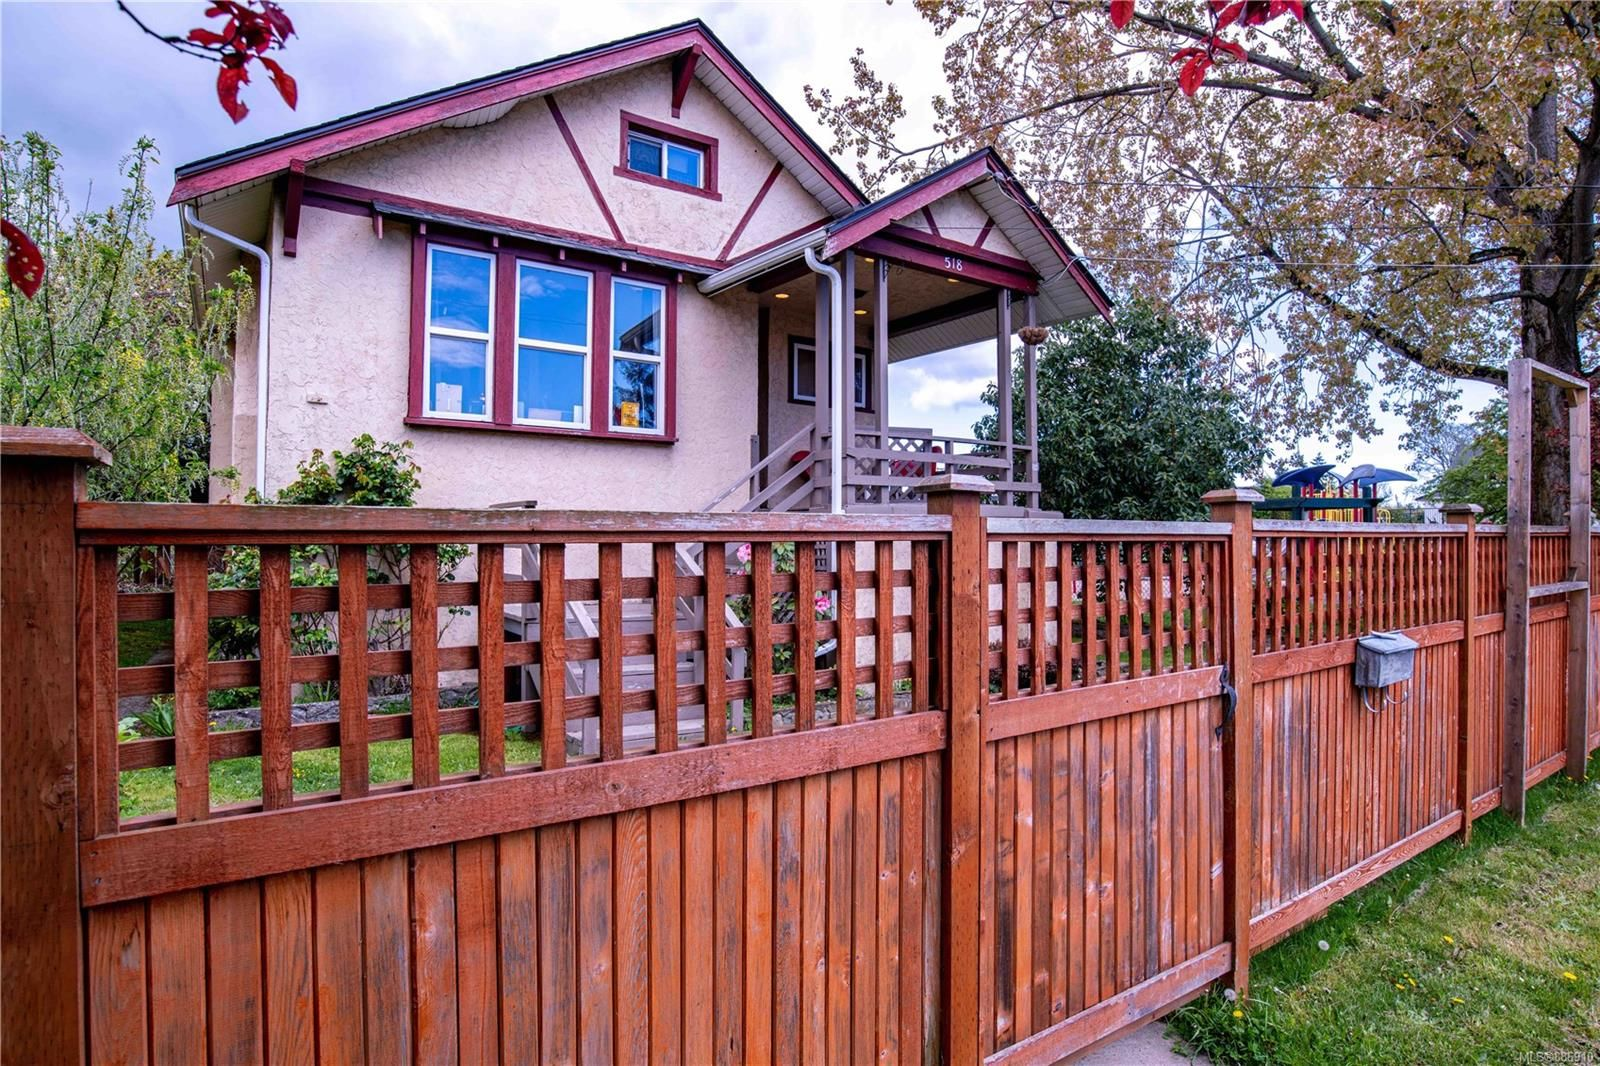 Main Photo: 518 Sumas St in Victoria: Vi Burnside House for sale : MLS®# 886910